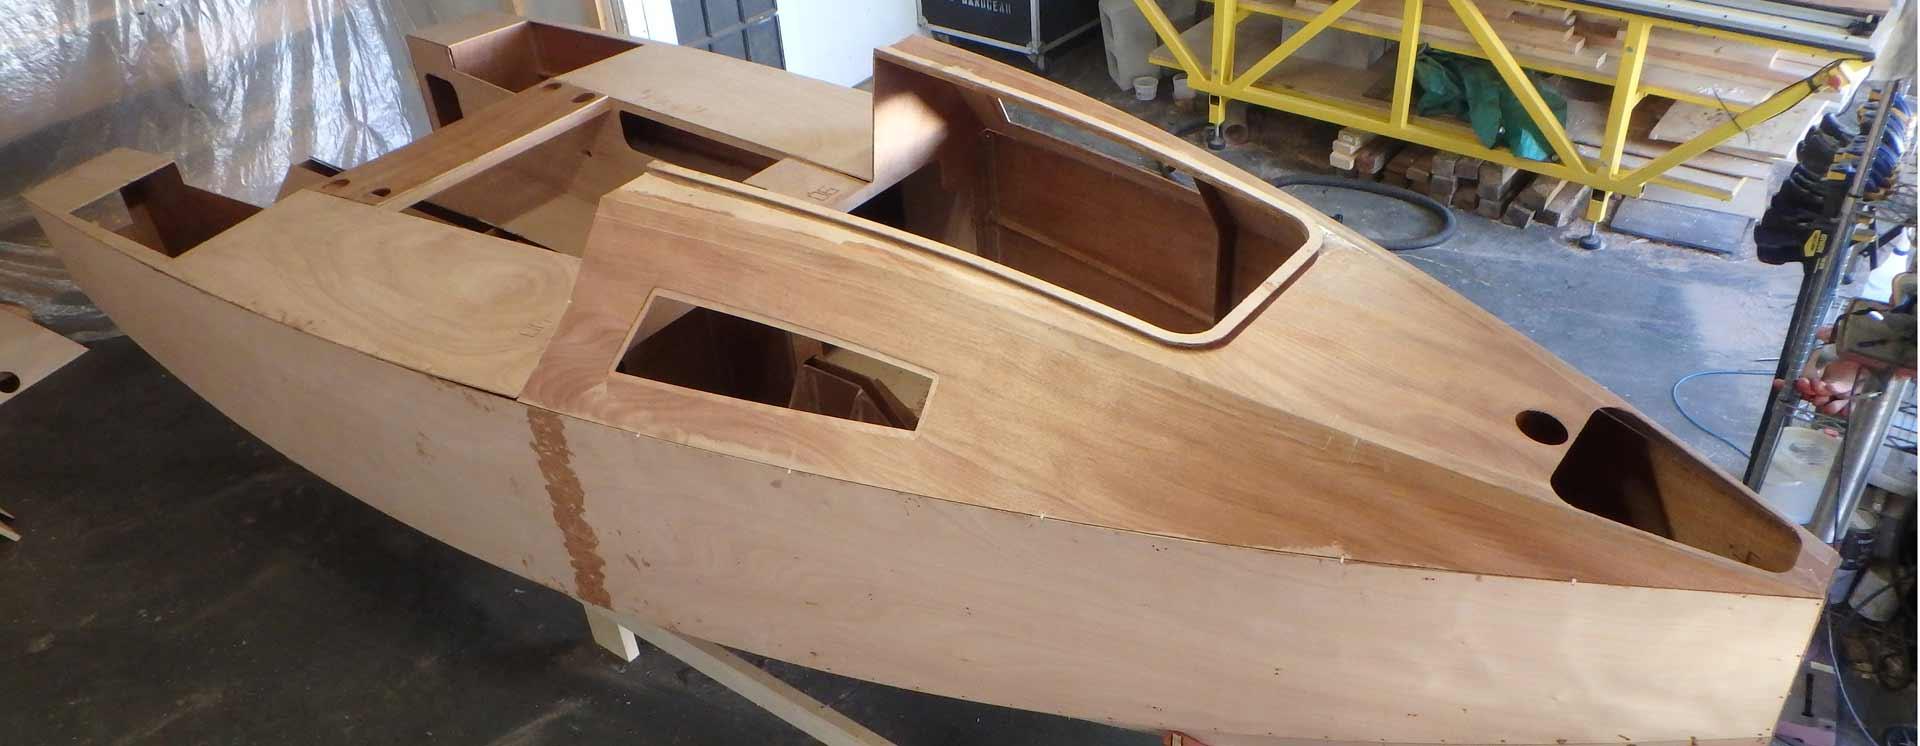 15′ RoG Micro-cruiser plywood kit – Bedard Yacht Design